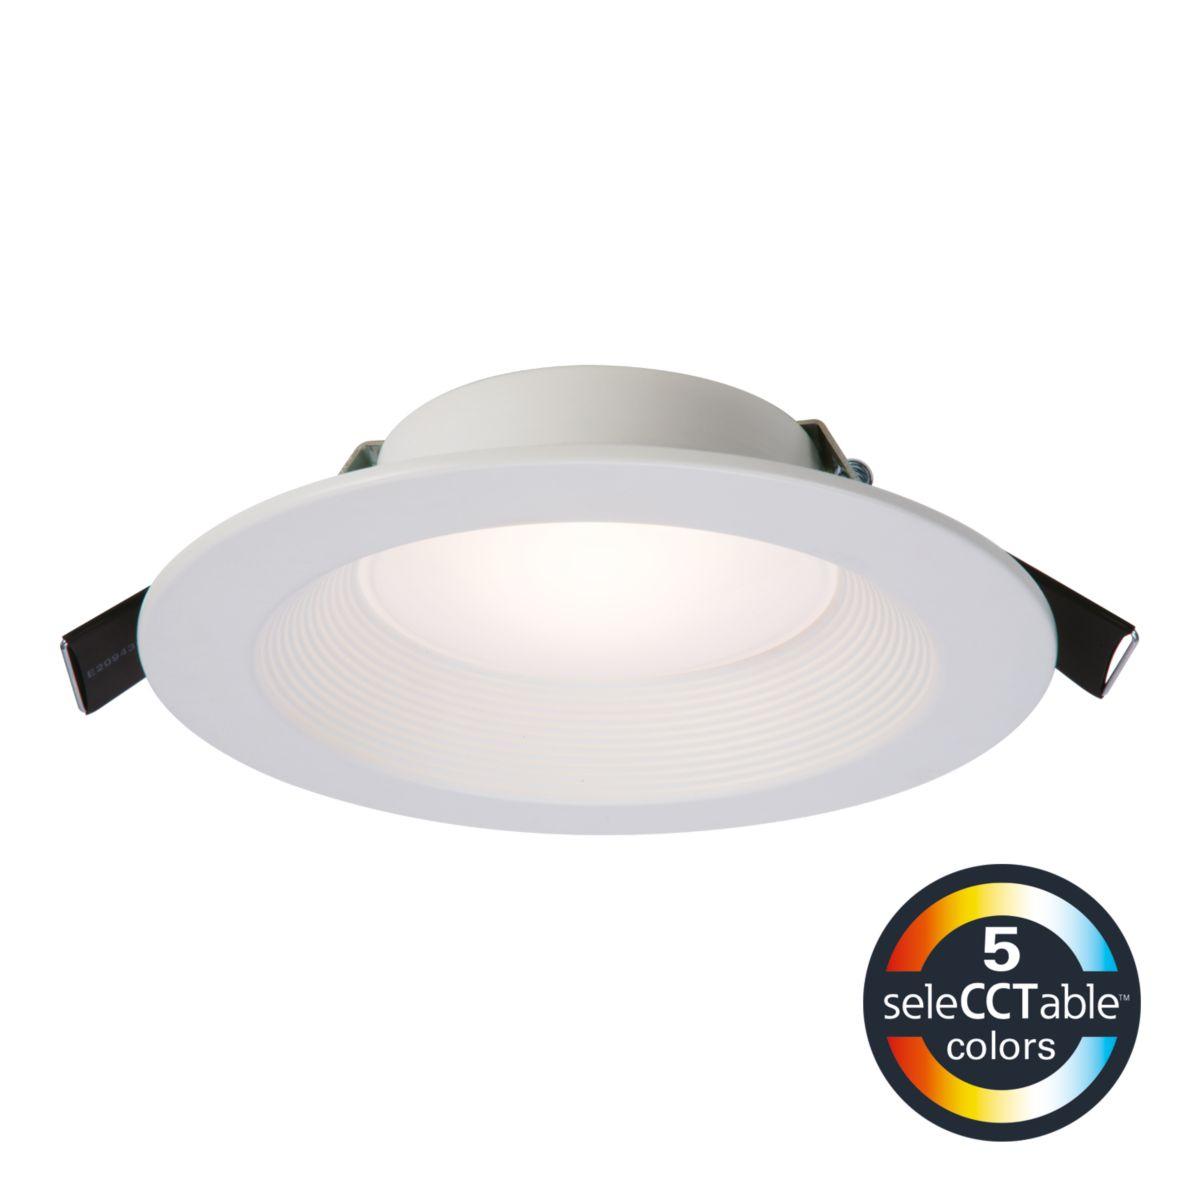 "RL6-DM LED 6"" Direct-Mount SeleCCTable™ Downlight"